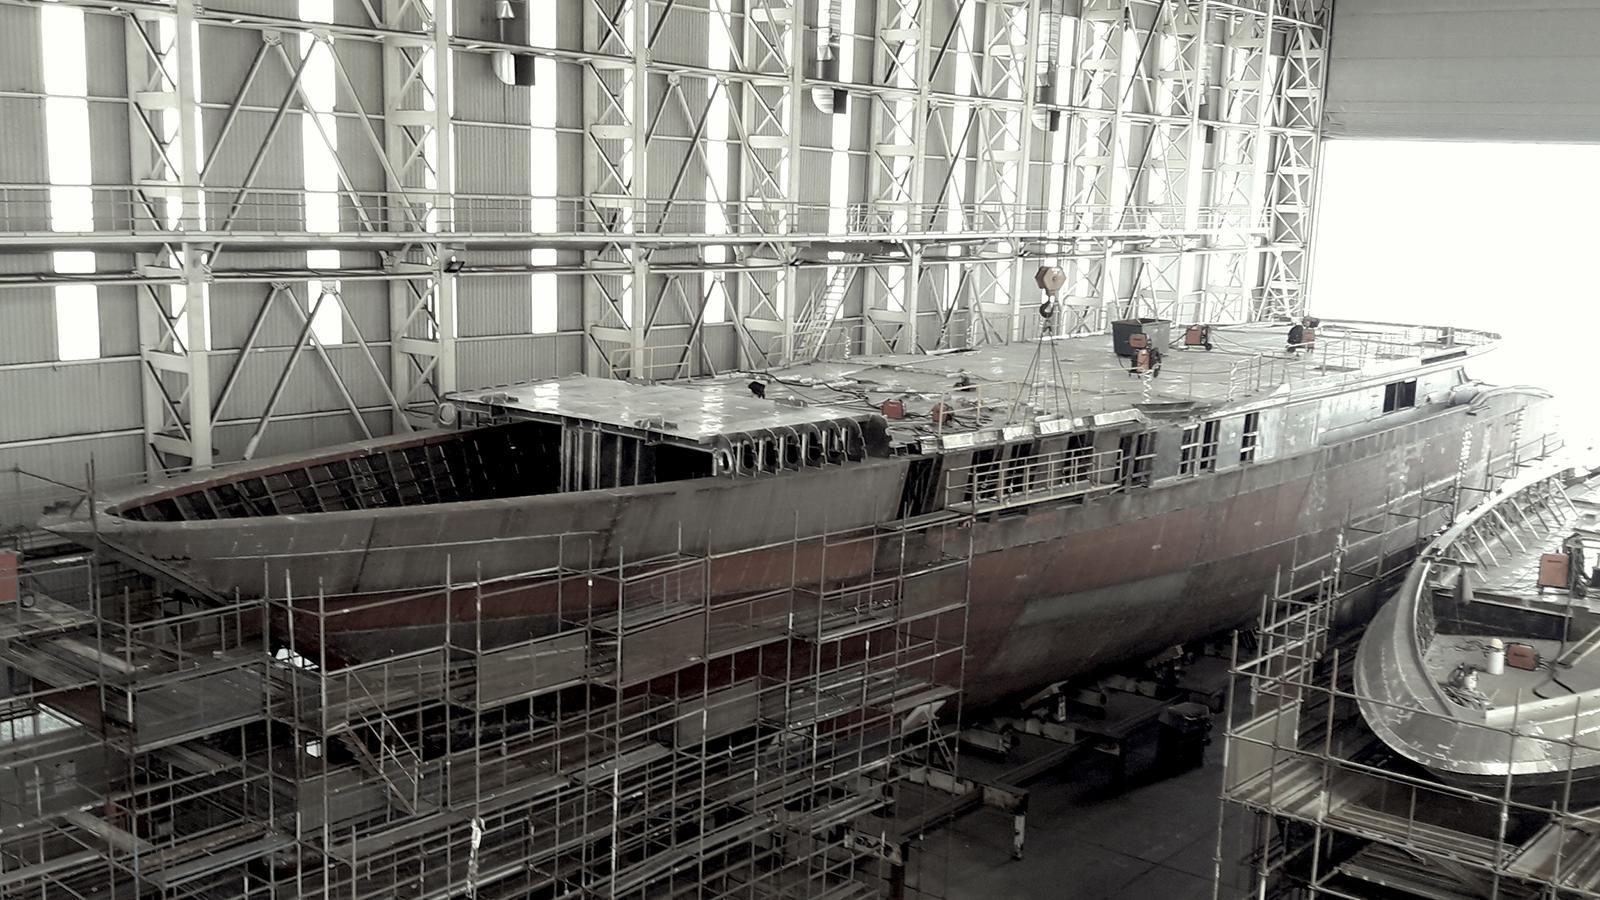 turquoise 74m motoryacht turquoise yachts 74m 2019 under construction